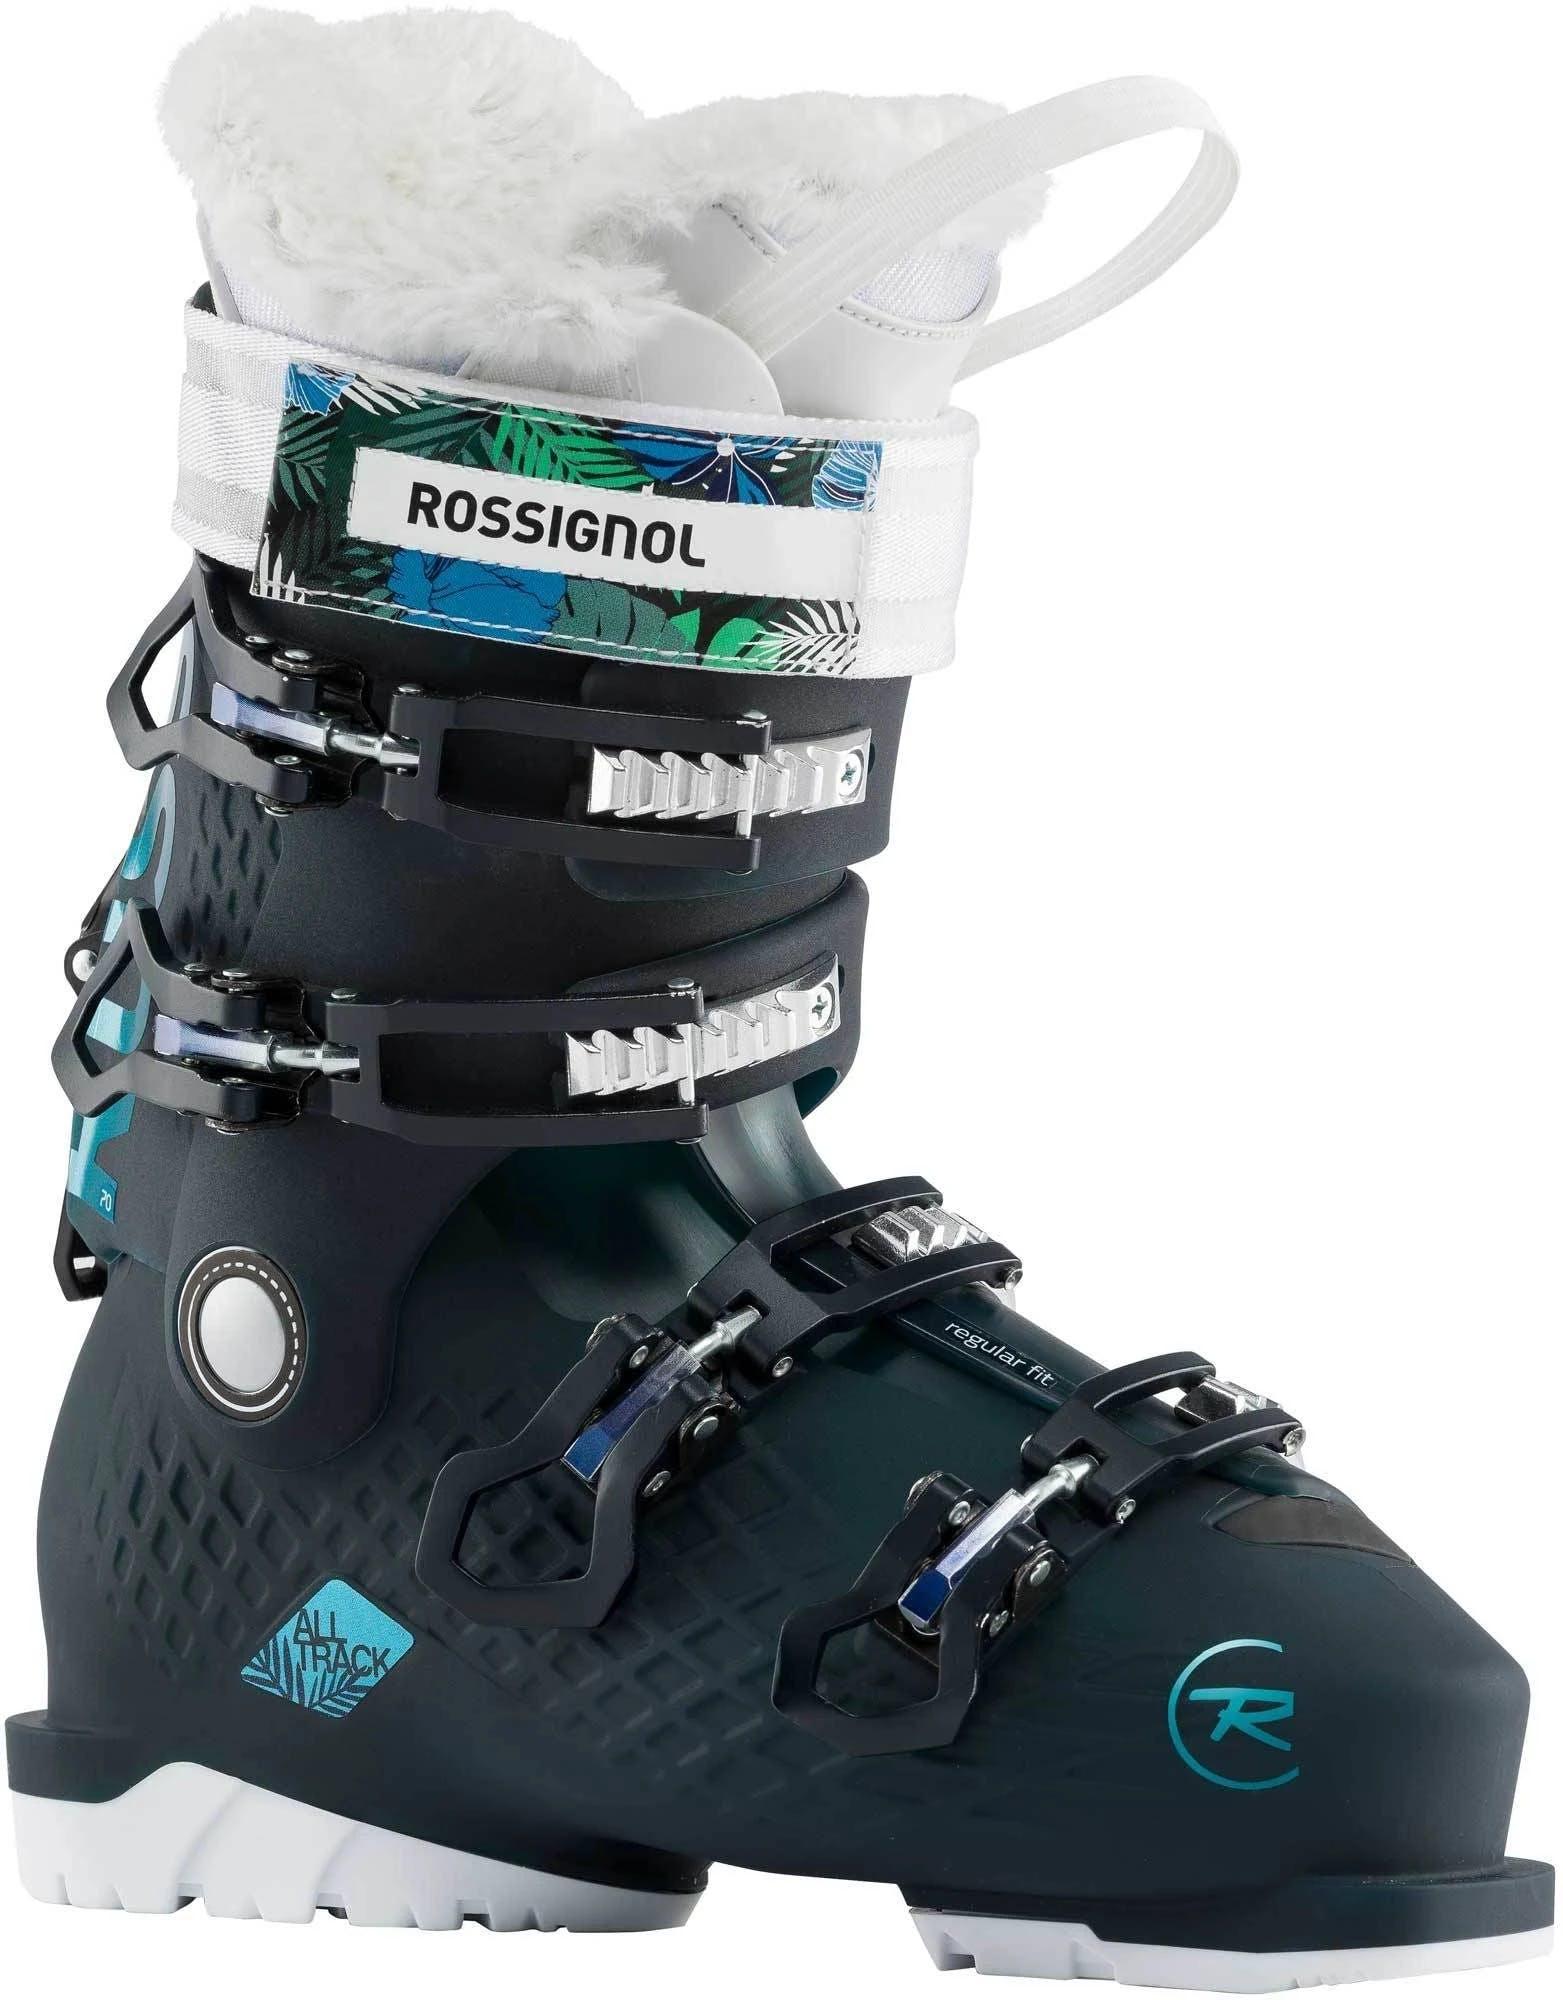 Rossignol Alltrack 70 Ski Boots